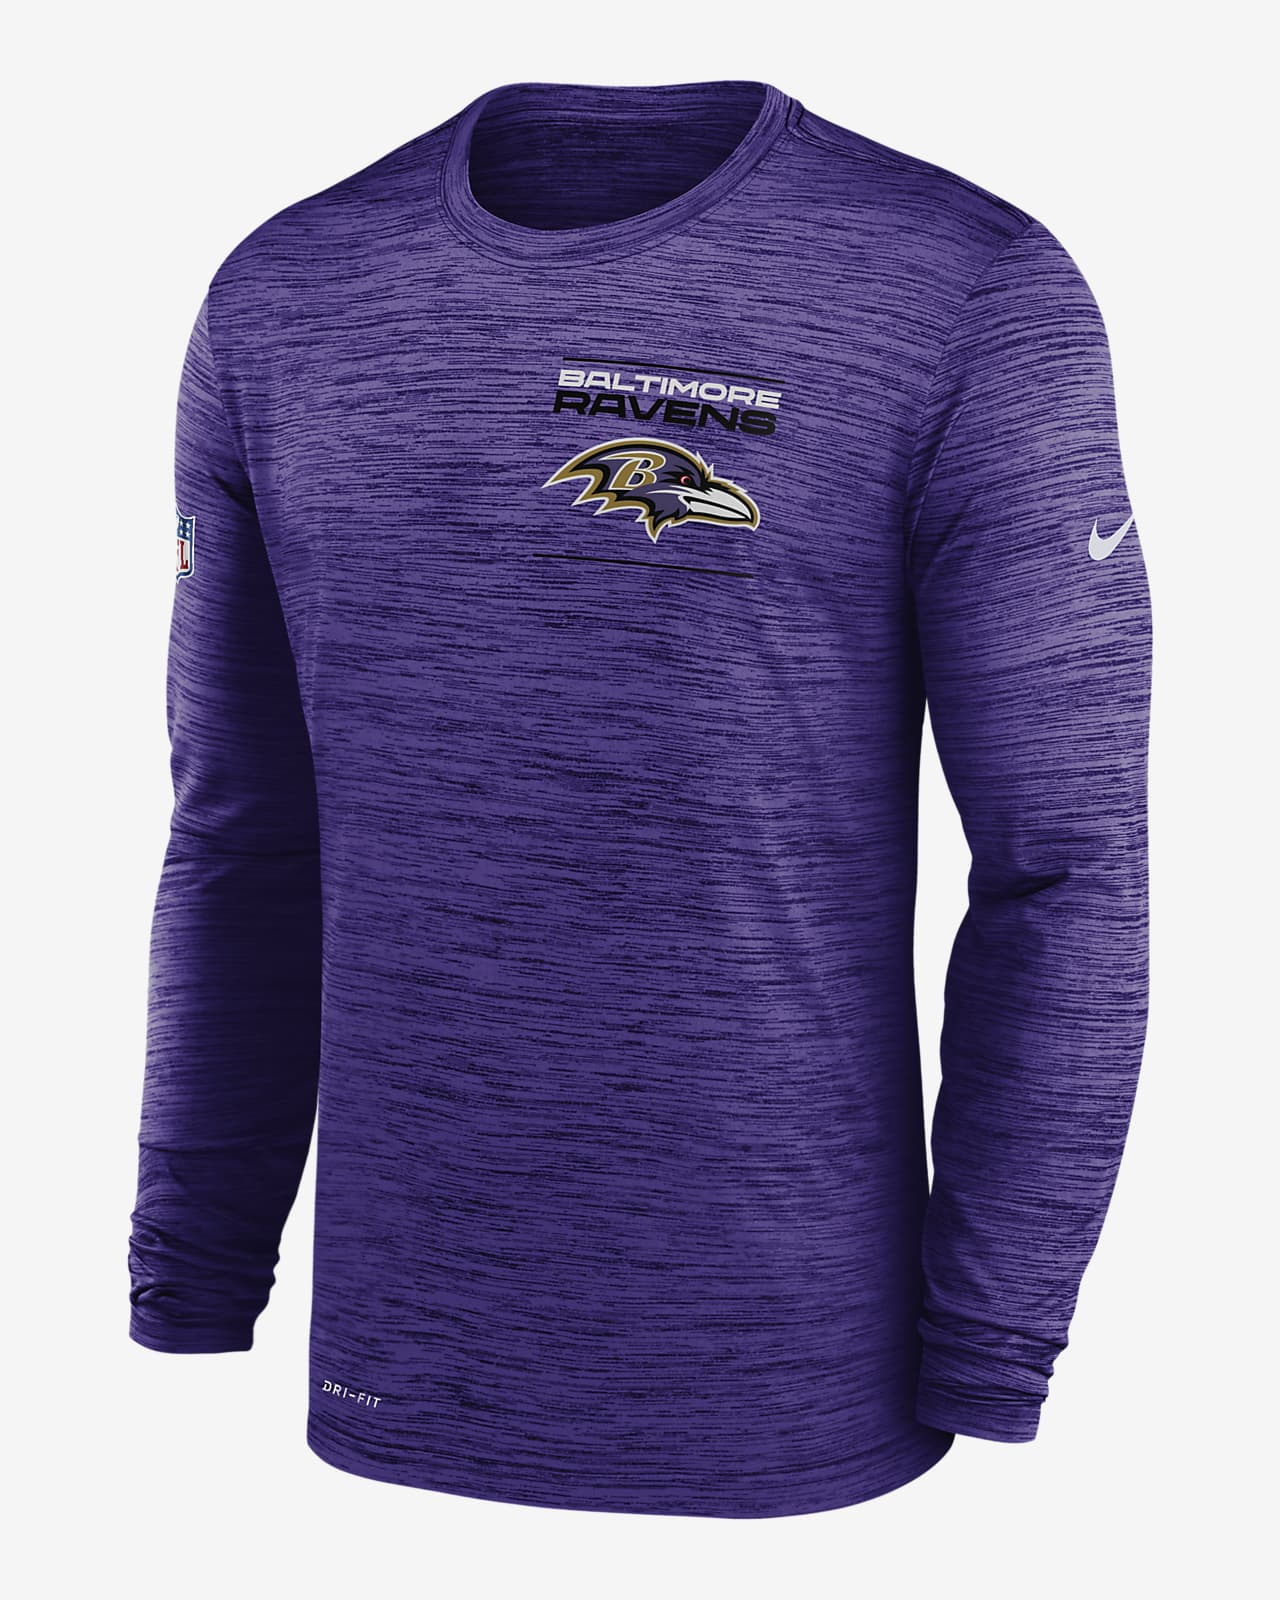 Nike Dri-FIT Sideline Velocity Legend (NFL Baltimore Ravens) Men's Long-Sleeve T-Shirt